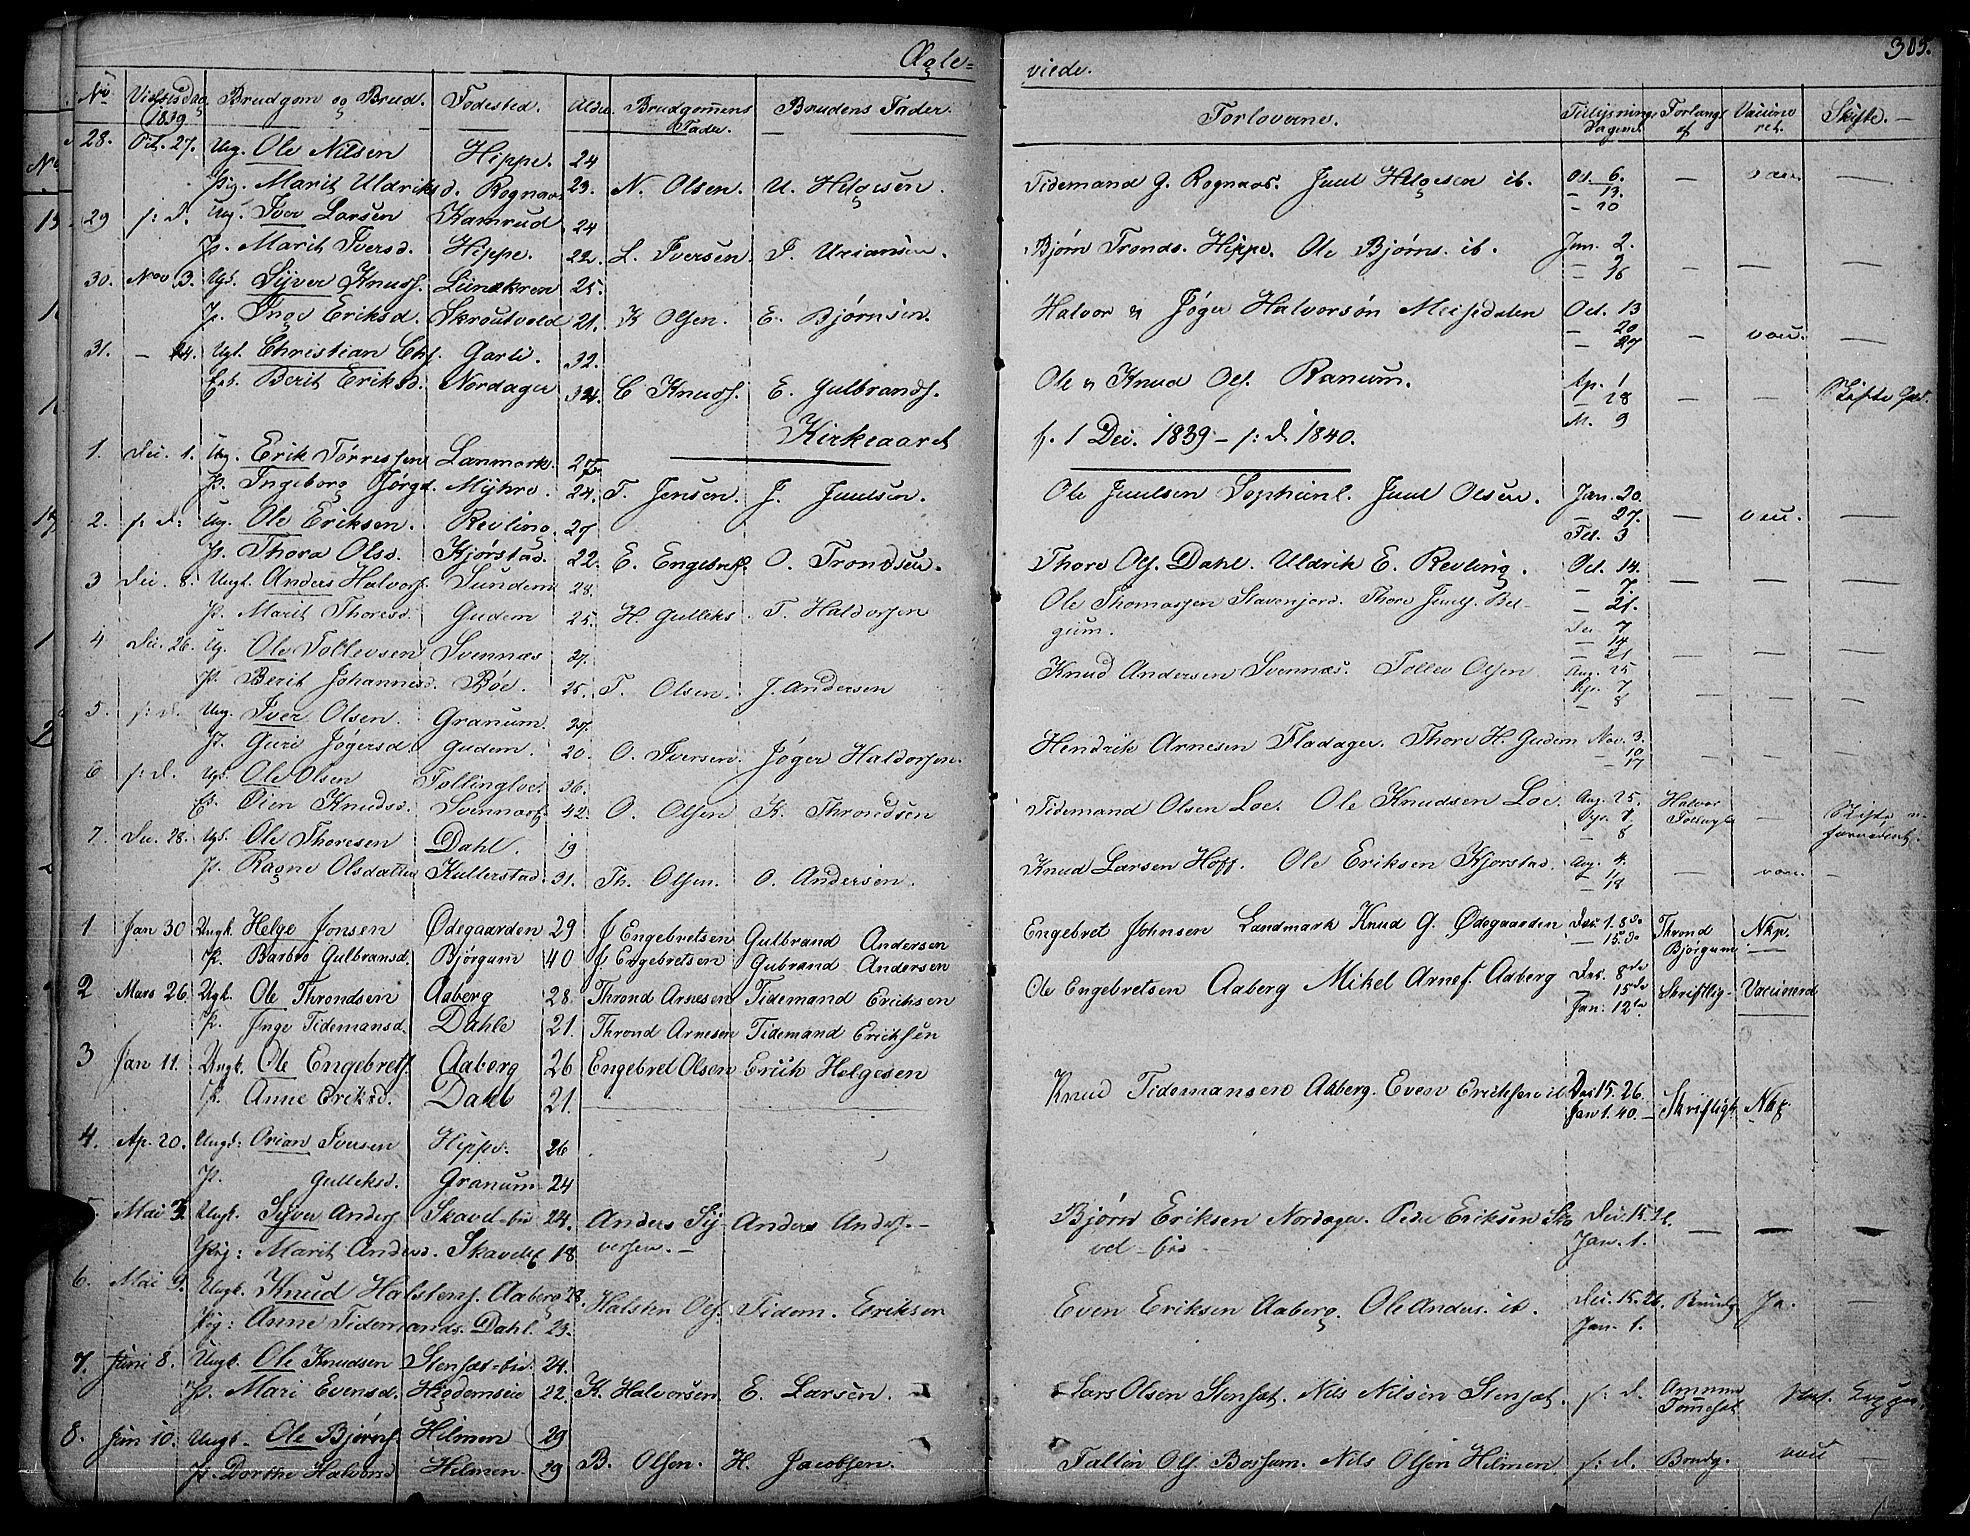 SAH, Nord-Aurdal prestekontor, Ministerialbok nr. 3, 1828-1841, s. 265